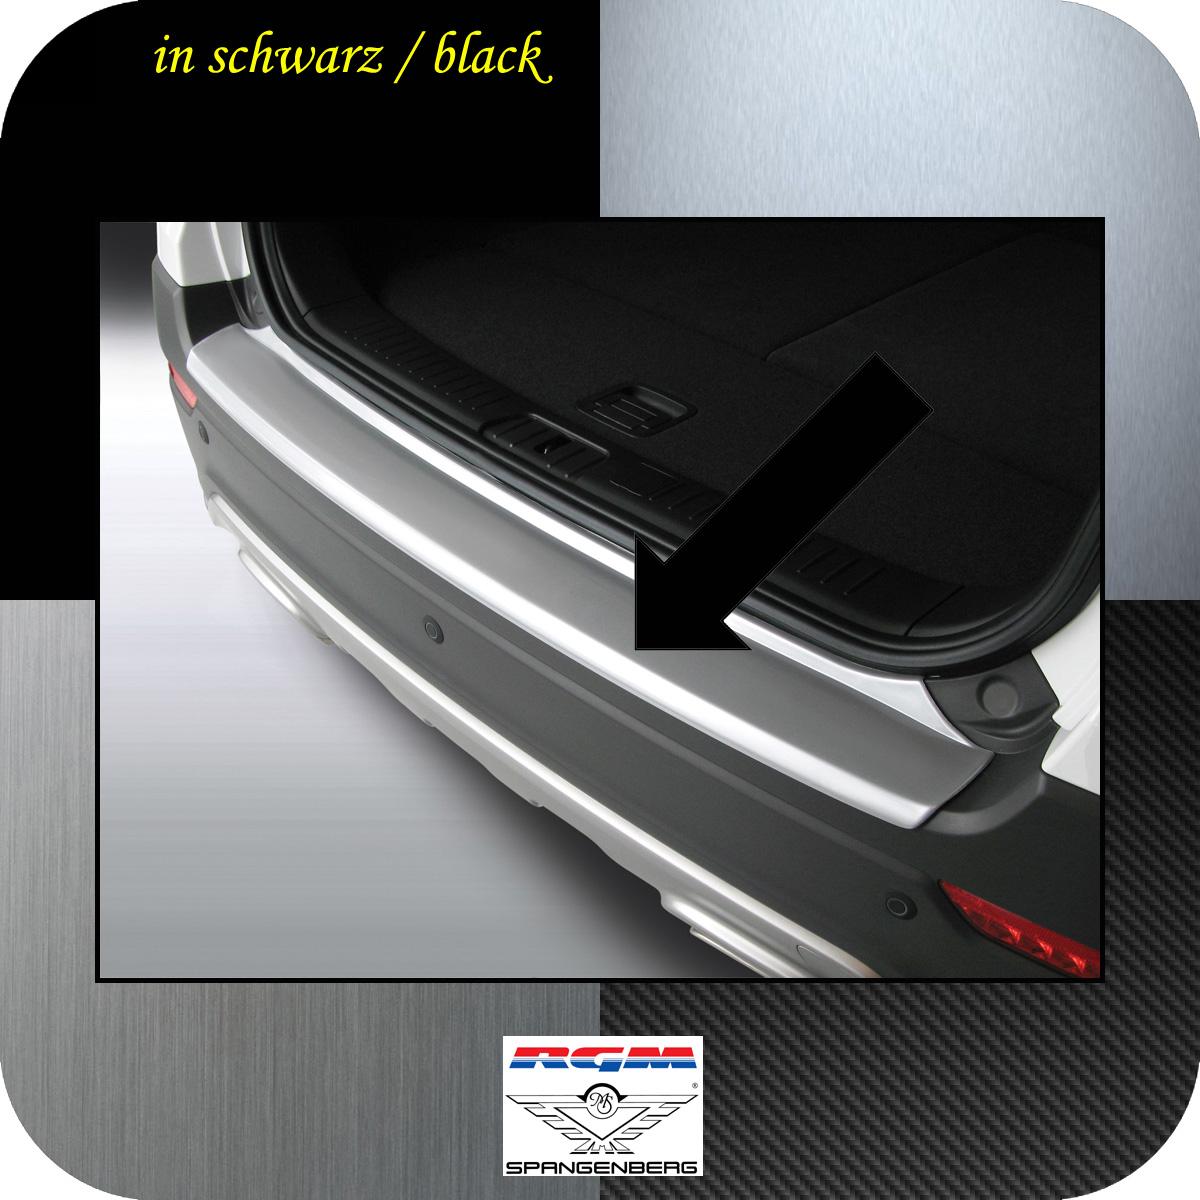 Ladekantenschutz schwarz Chevrolet Captiva SUV 4X4 ab facelift 2013- 3500611